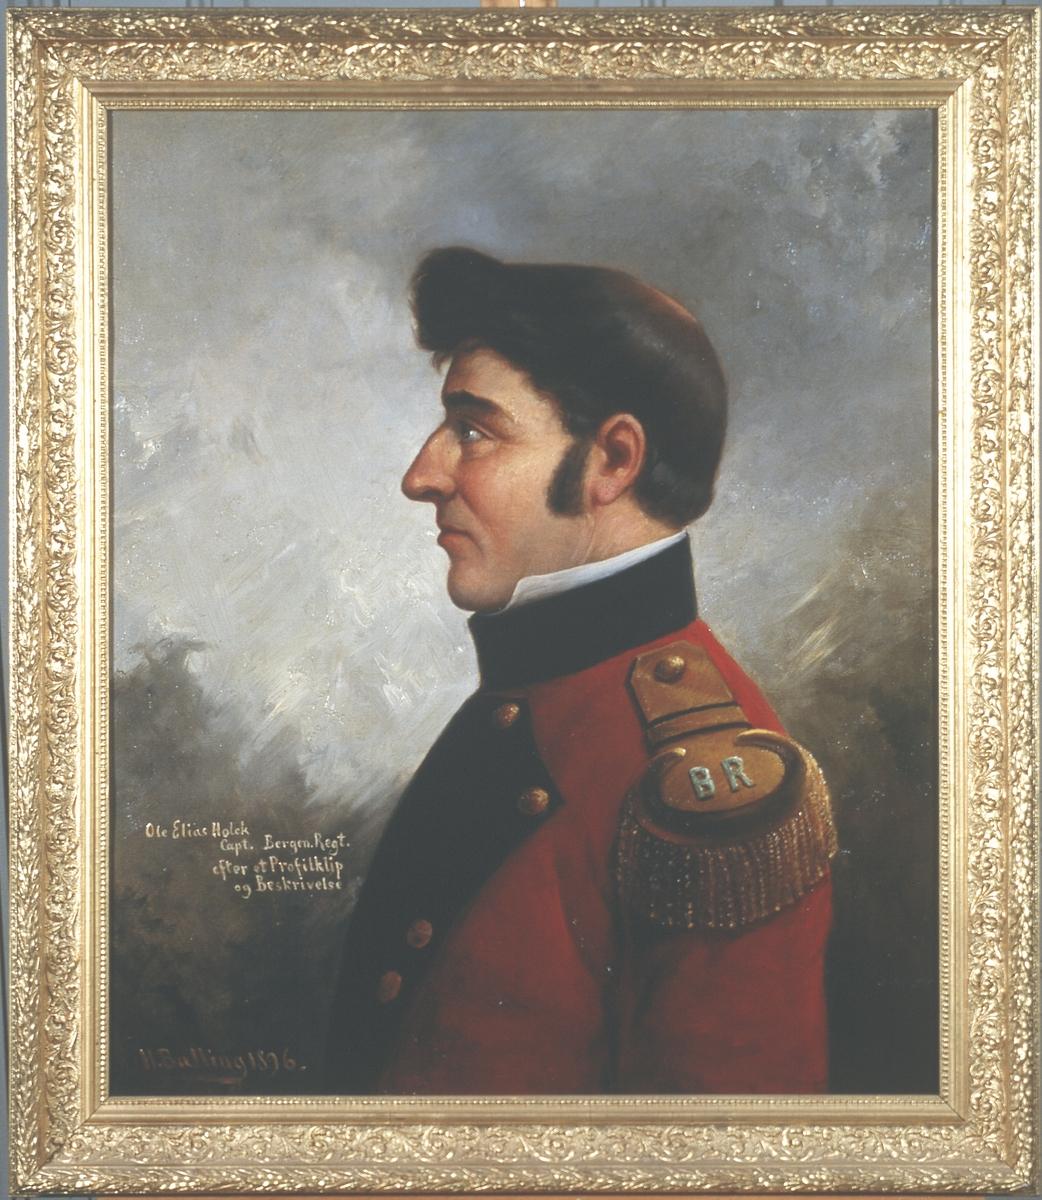 Holck, Ole Elias (1774 - 1842)